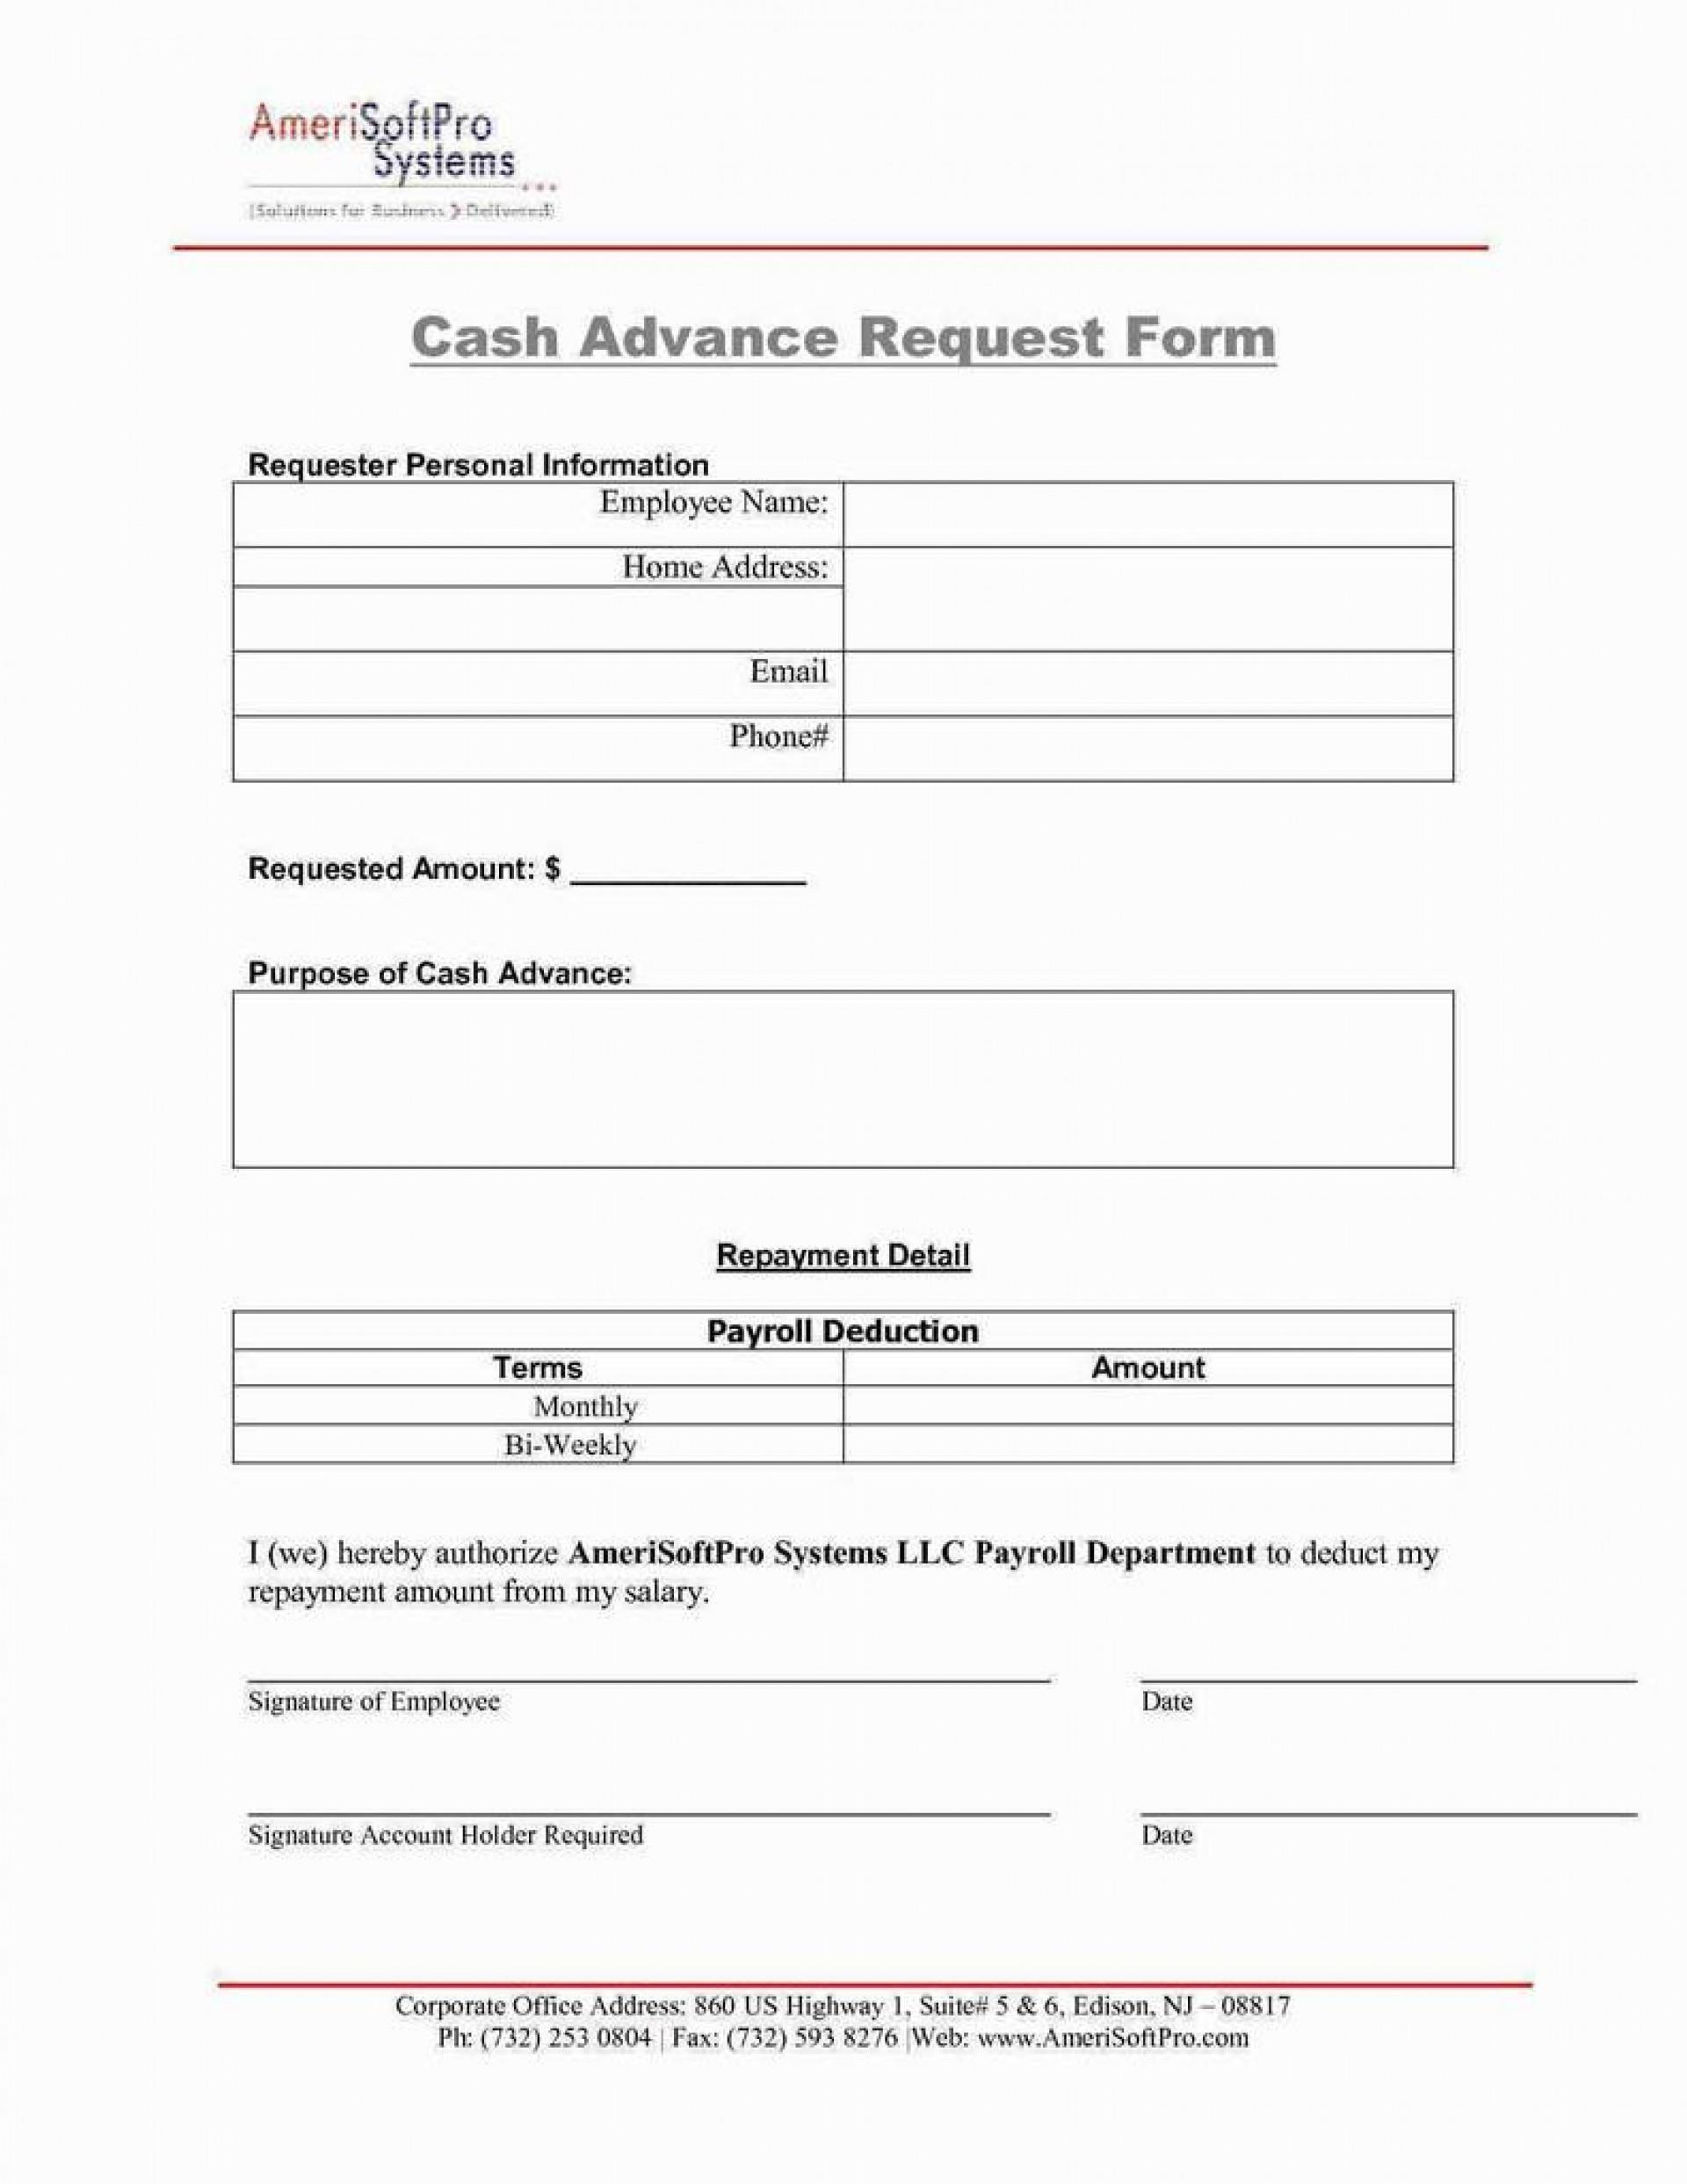 009 Awful New Customer Form Template Word High Resolution  Registration Account Feedback1920